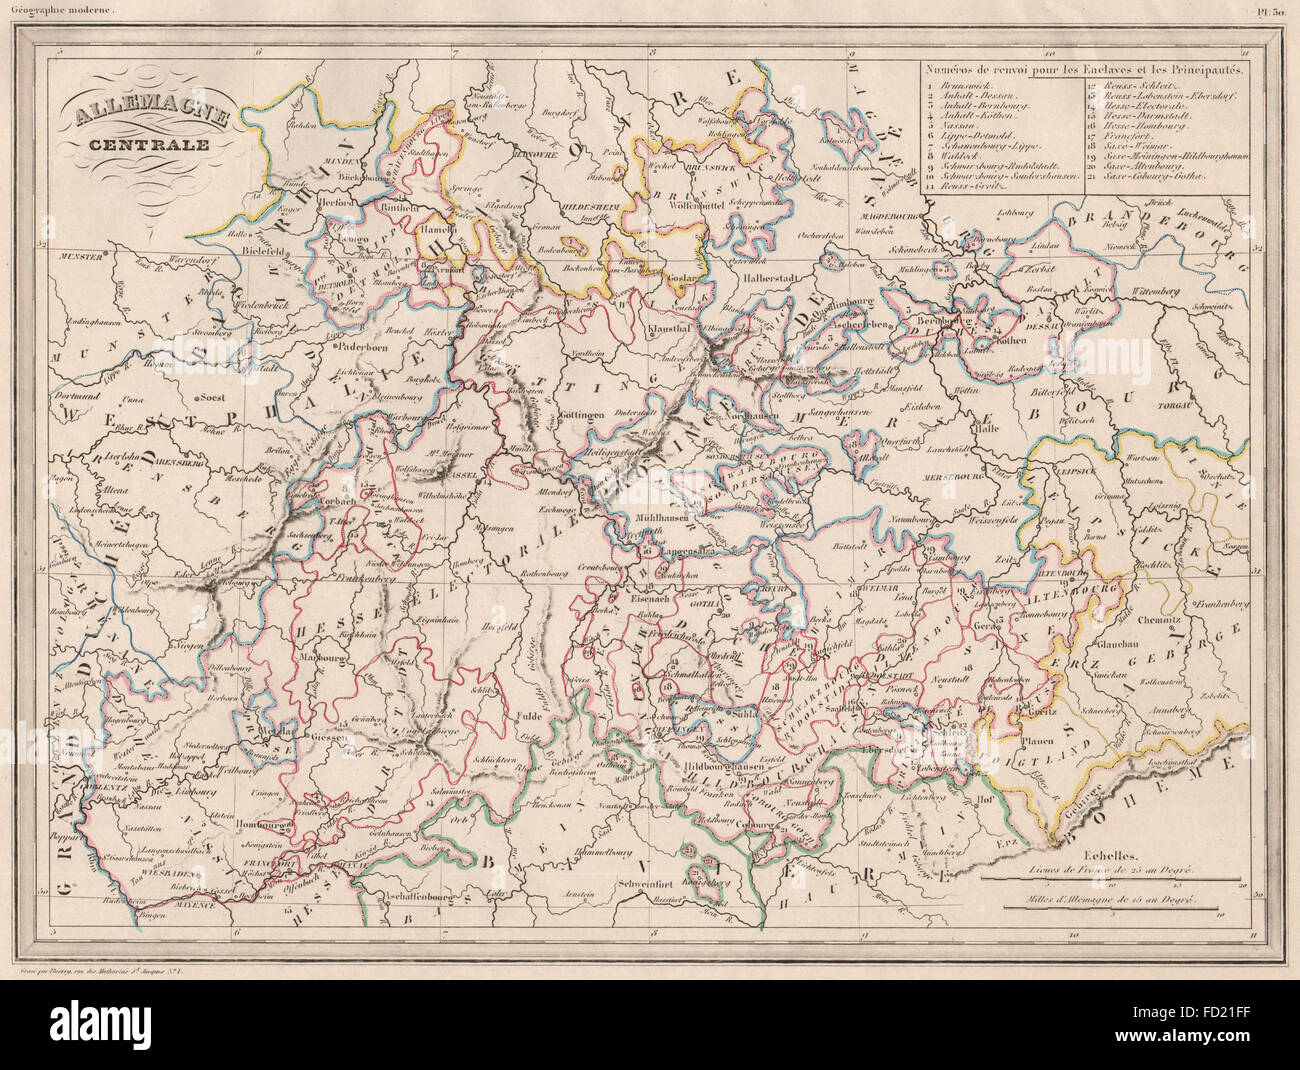 Central Germany Map.Central Germany Map Stock Photos Central Germany Map Stock Images